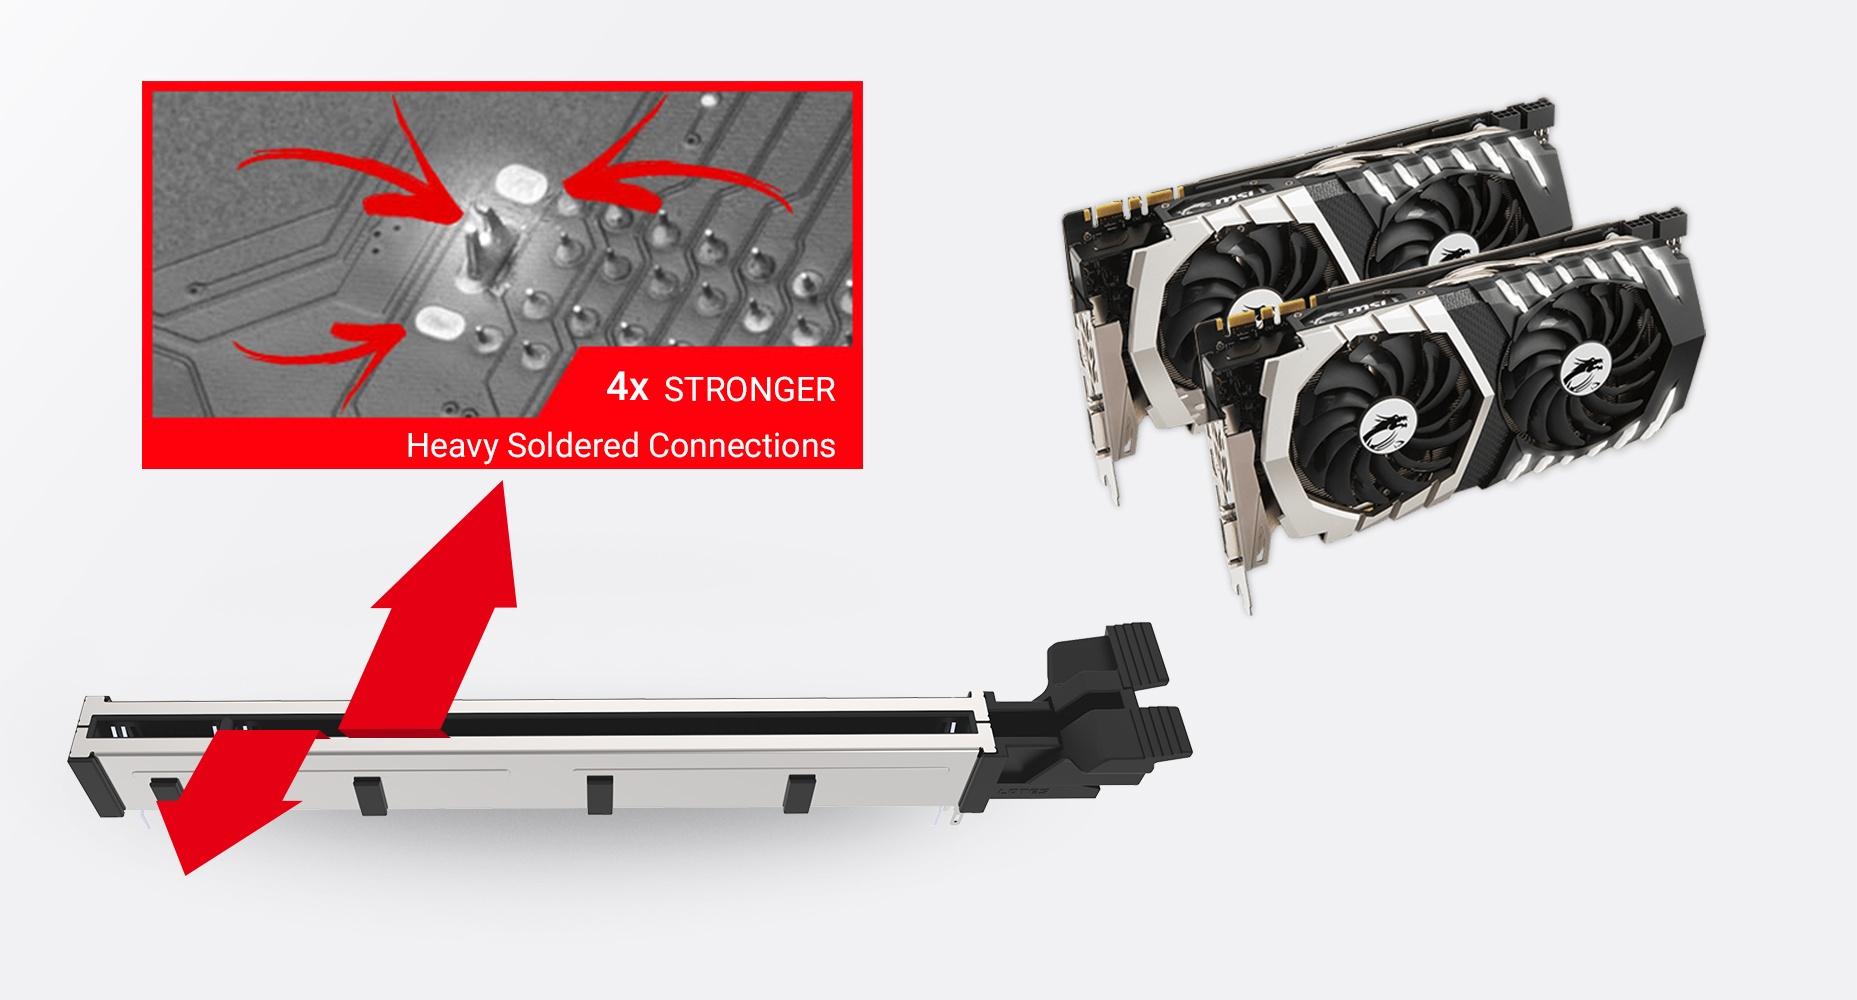 MSI MEG B550 UNIFY MULTIPLE GPU SUPPORTS AND STEEL ARMOR